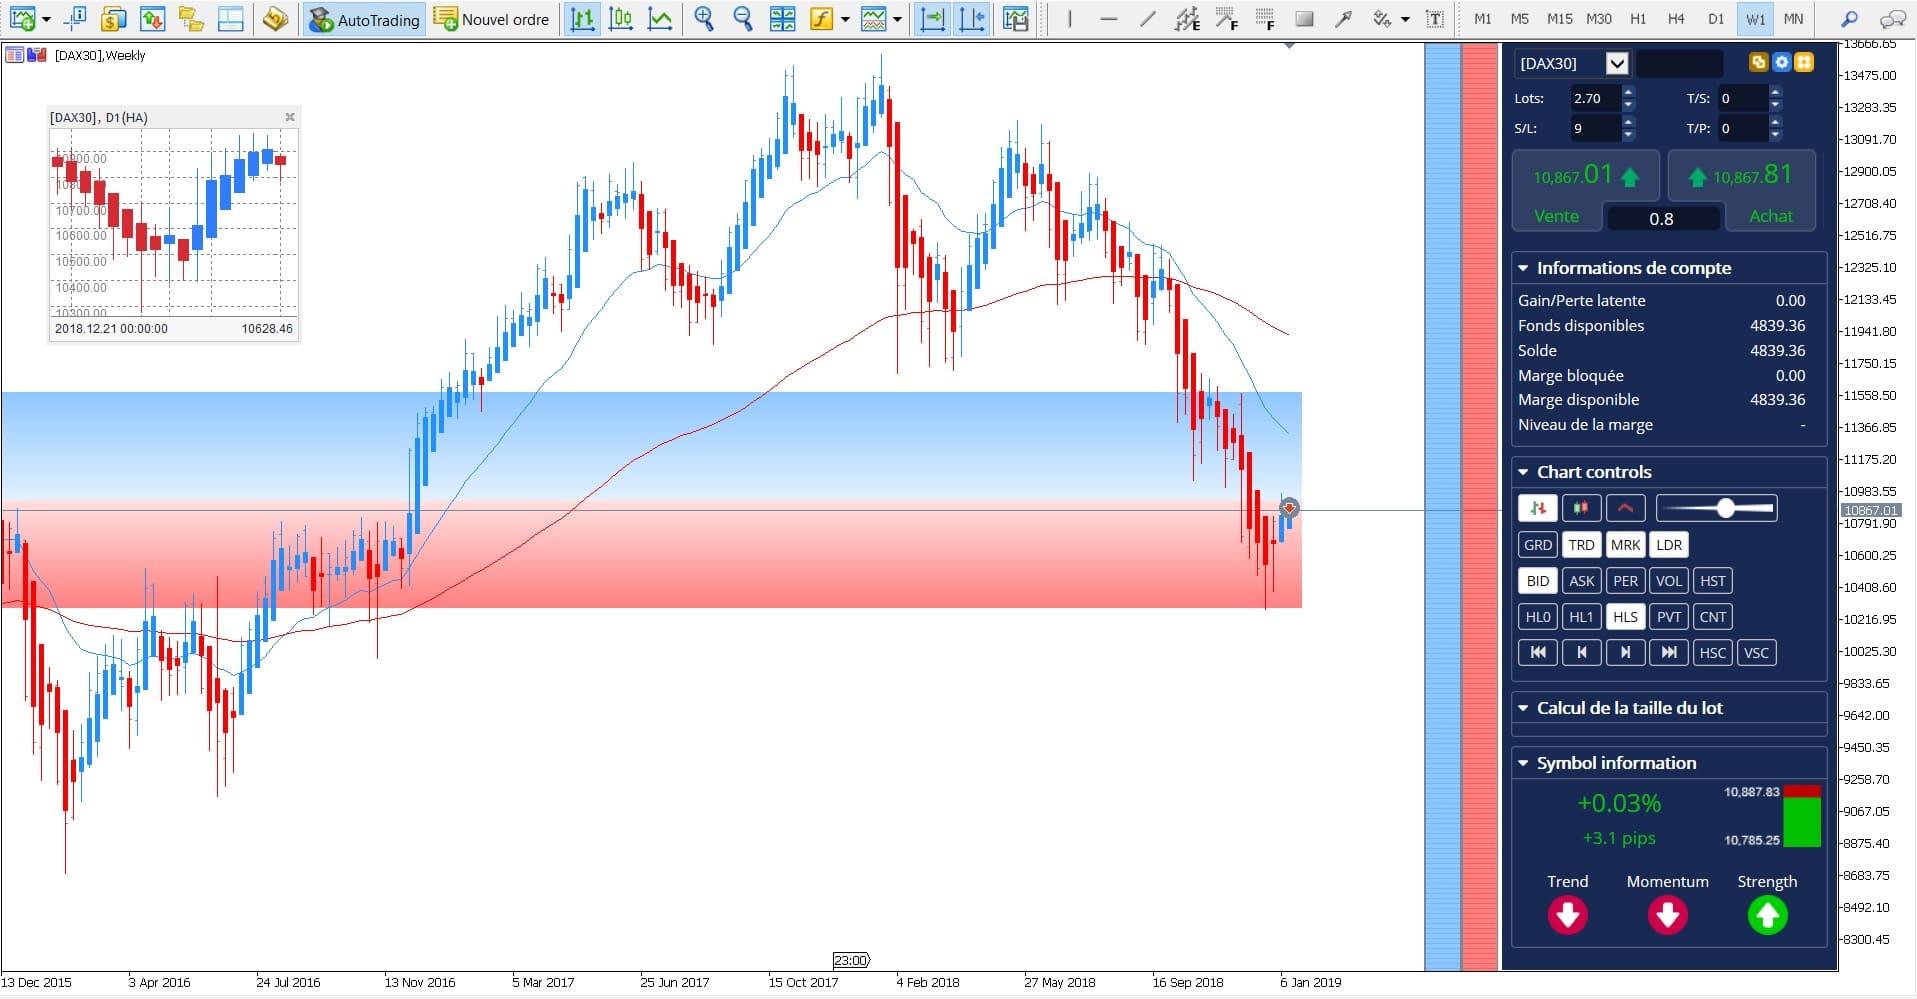 Swing Trading - DAX30 CFD